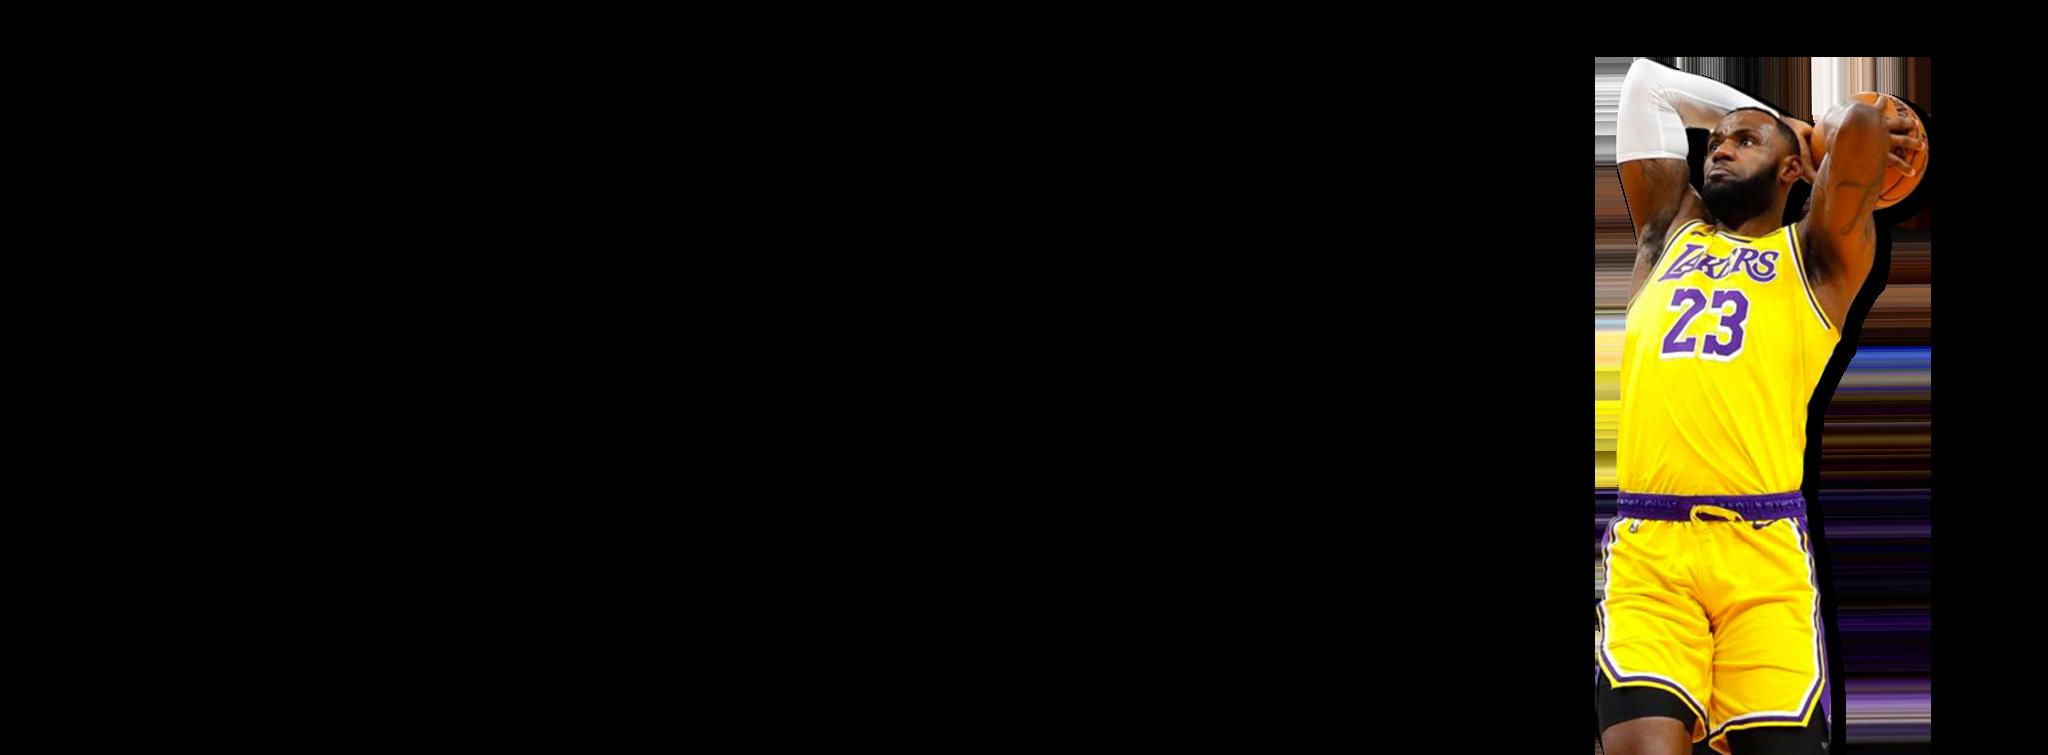 LEBRON-2